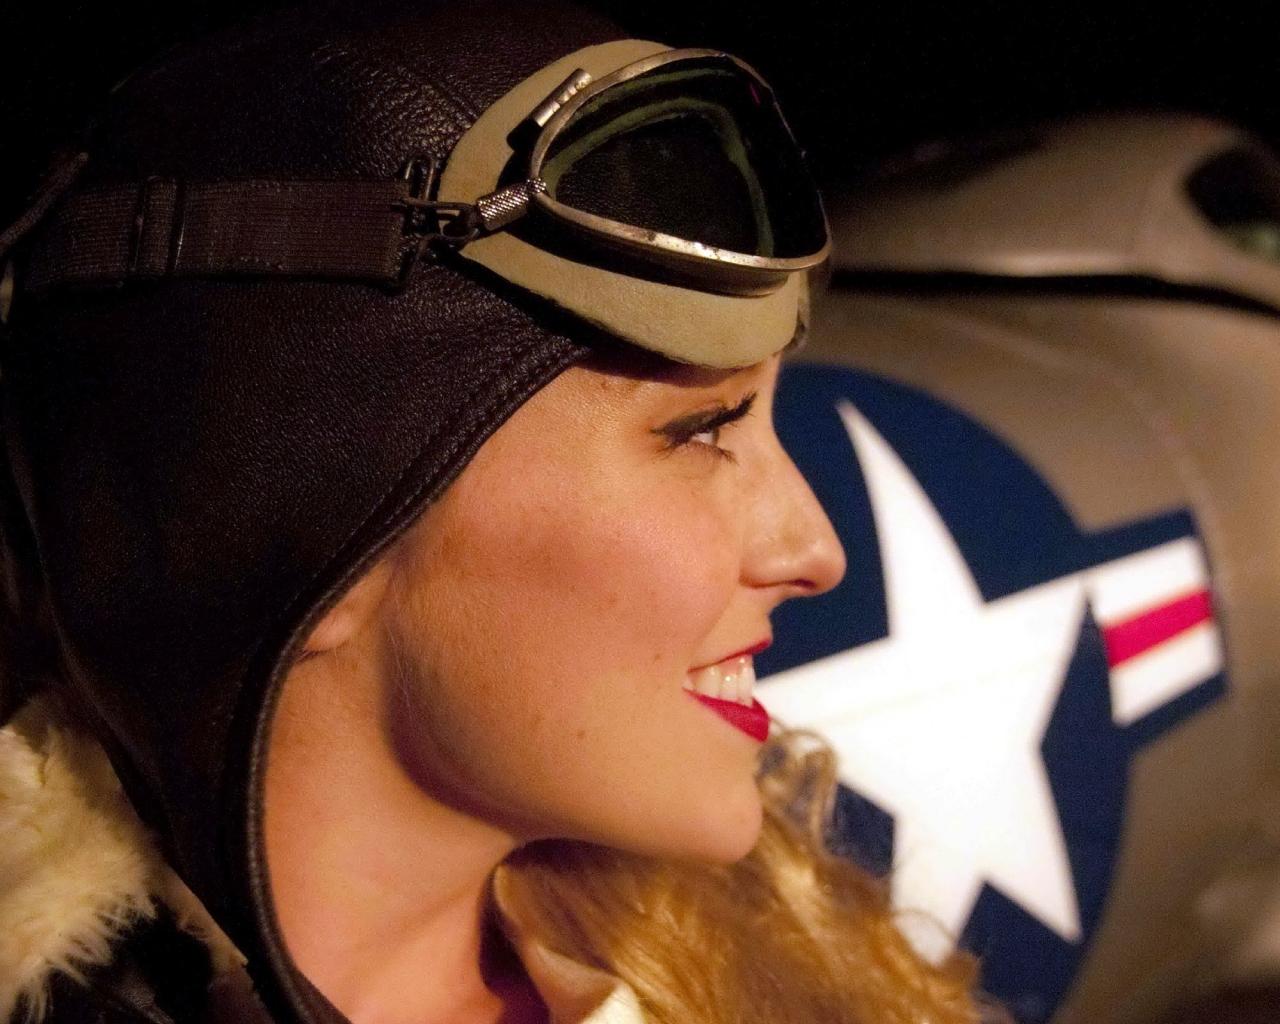 Una chica piloto de aviones - 1280x1024